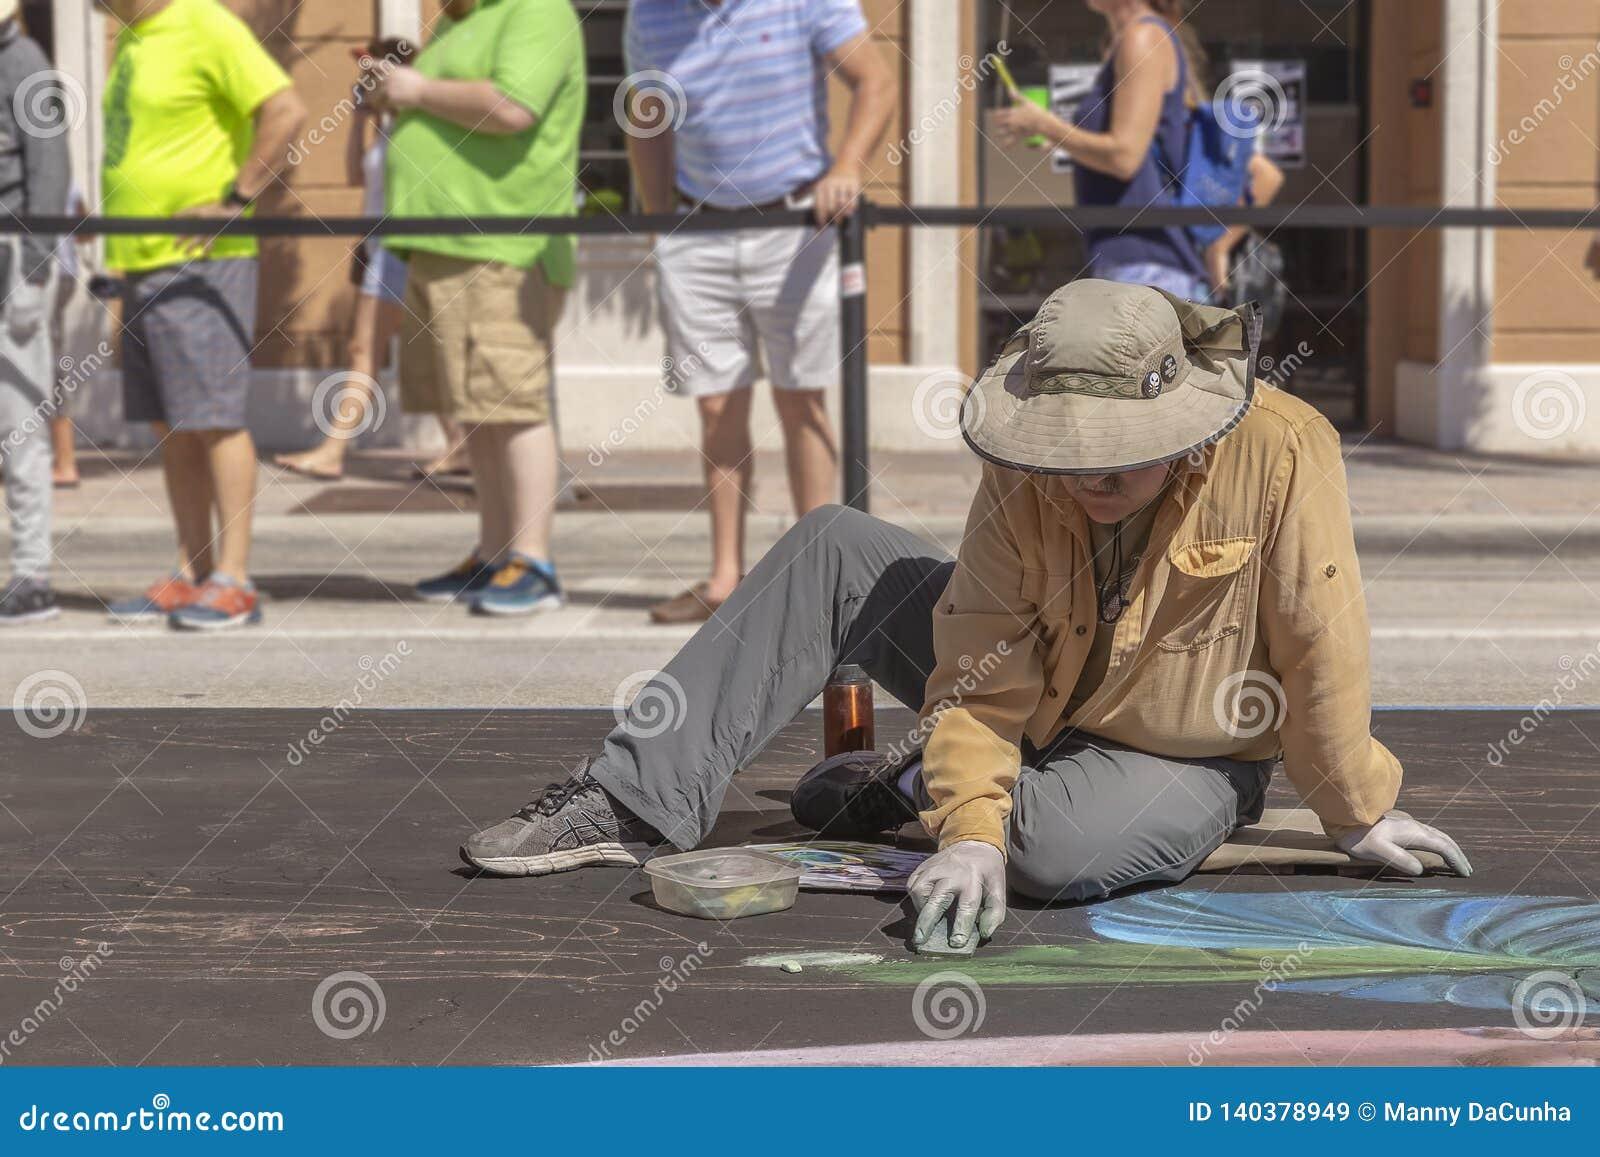 Valor do lago, Florida, EUA 23-24 fabuloso, 25o Fest anual da pintura da rua 2019